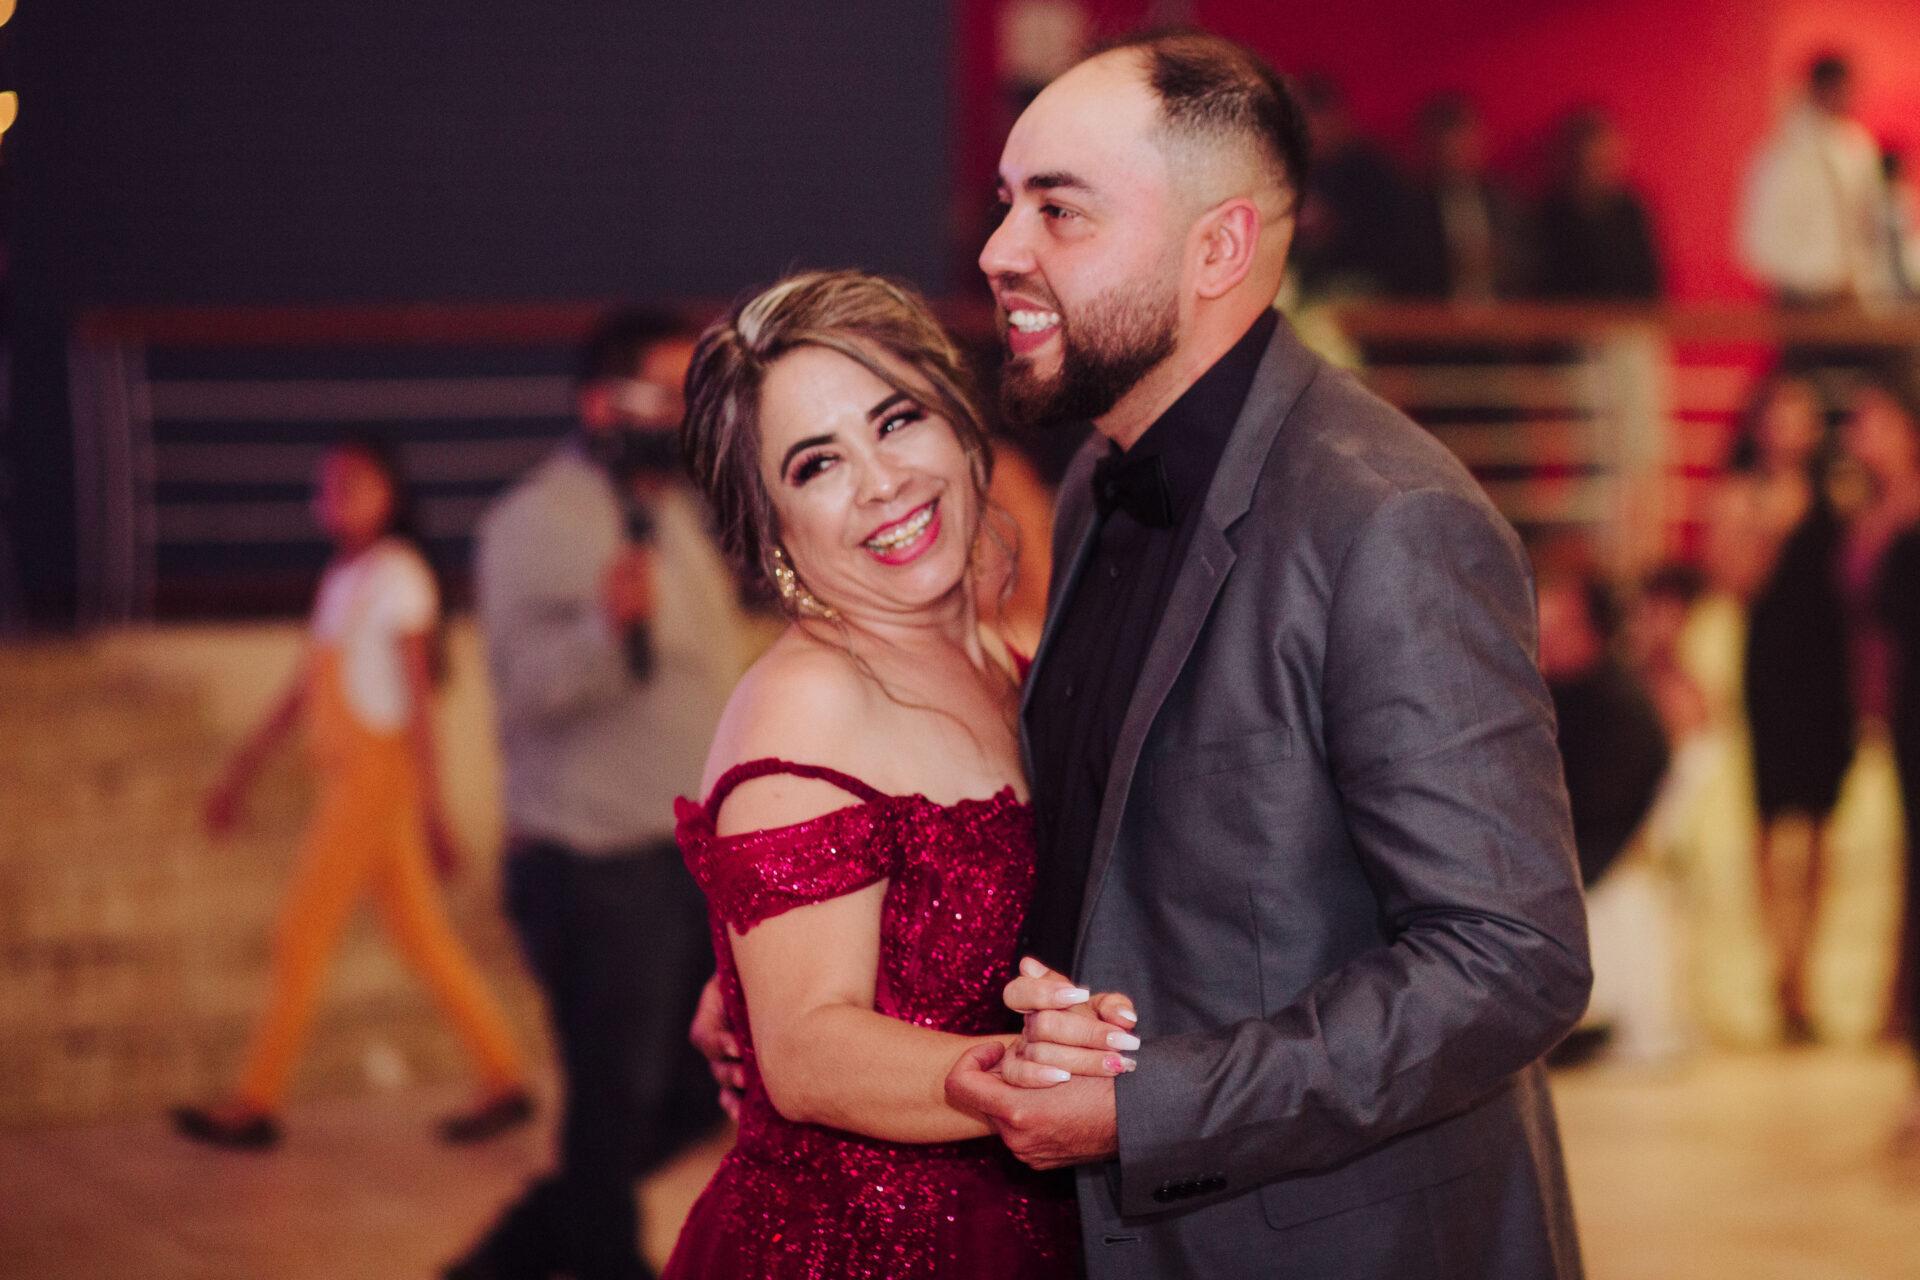 javier_noriega_fotografo_bodas_zacatecas_fresnillo_chihuahua_wedding_photographer26